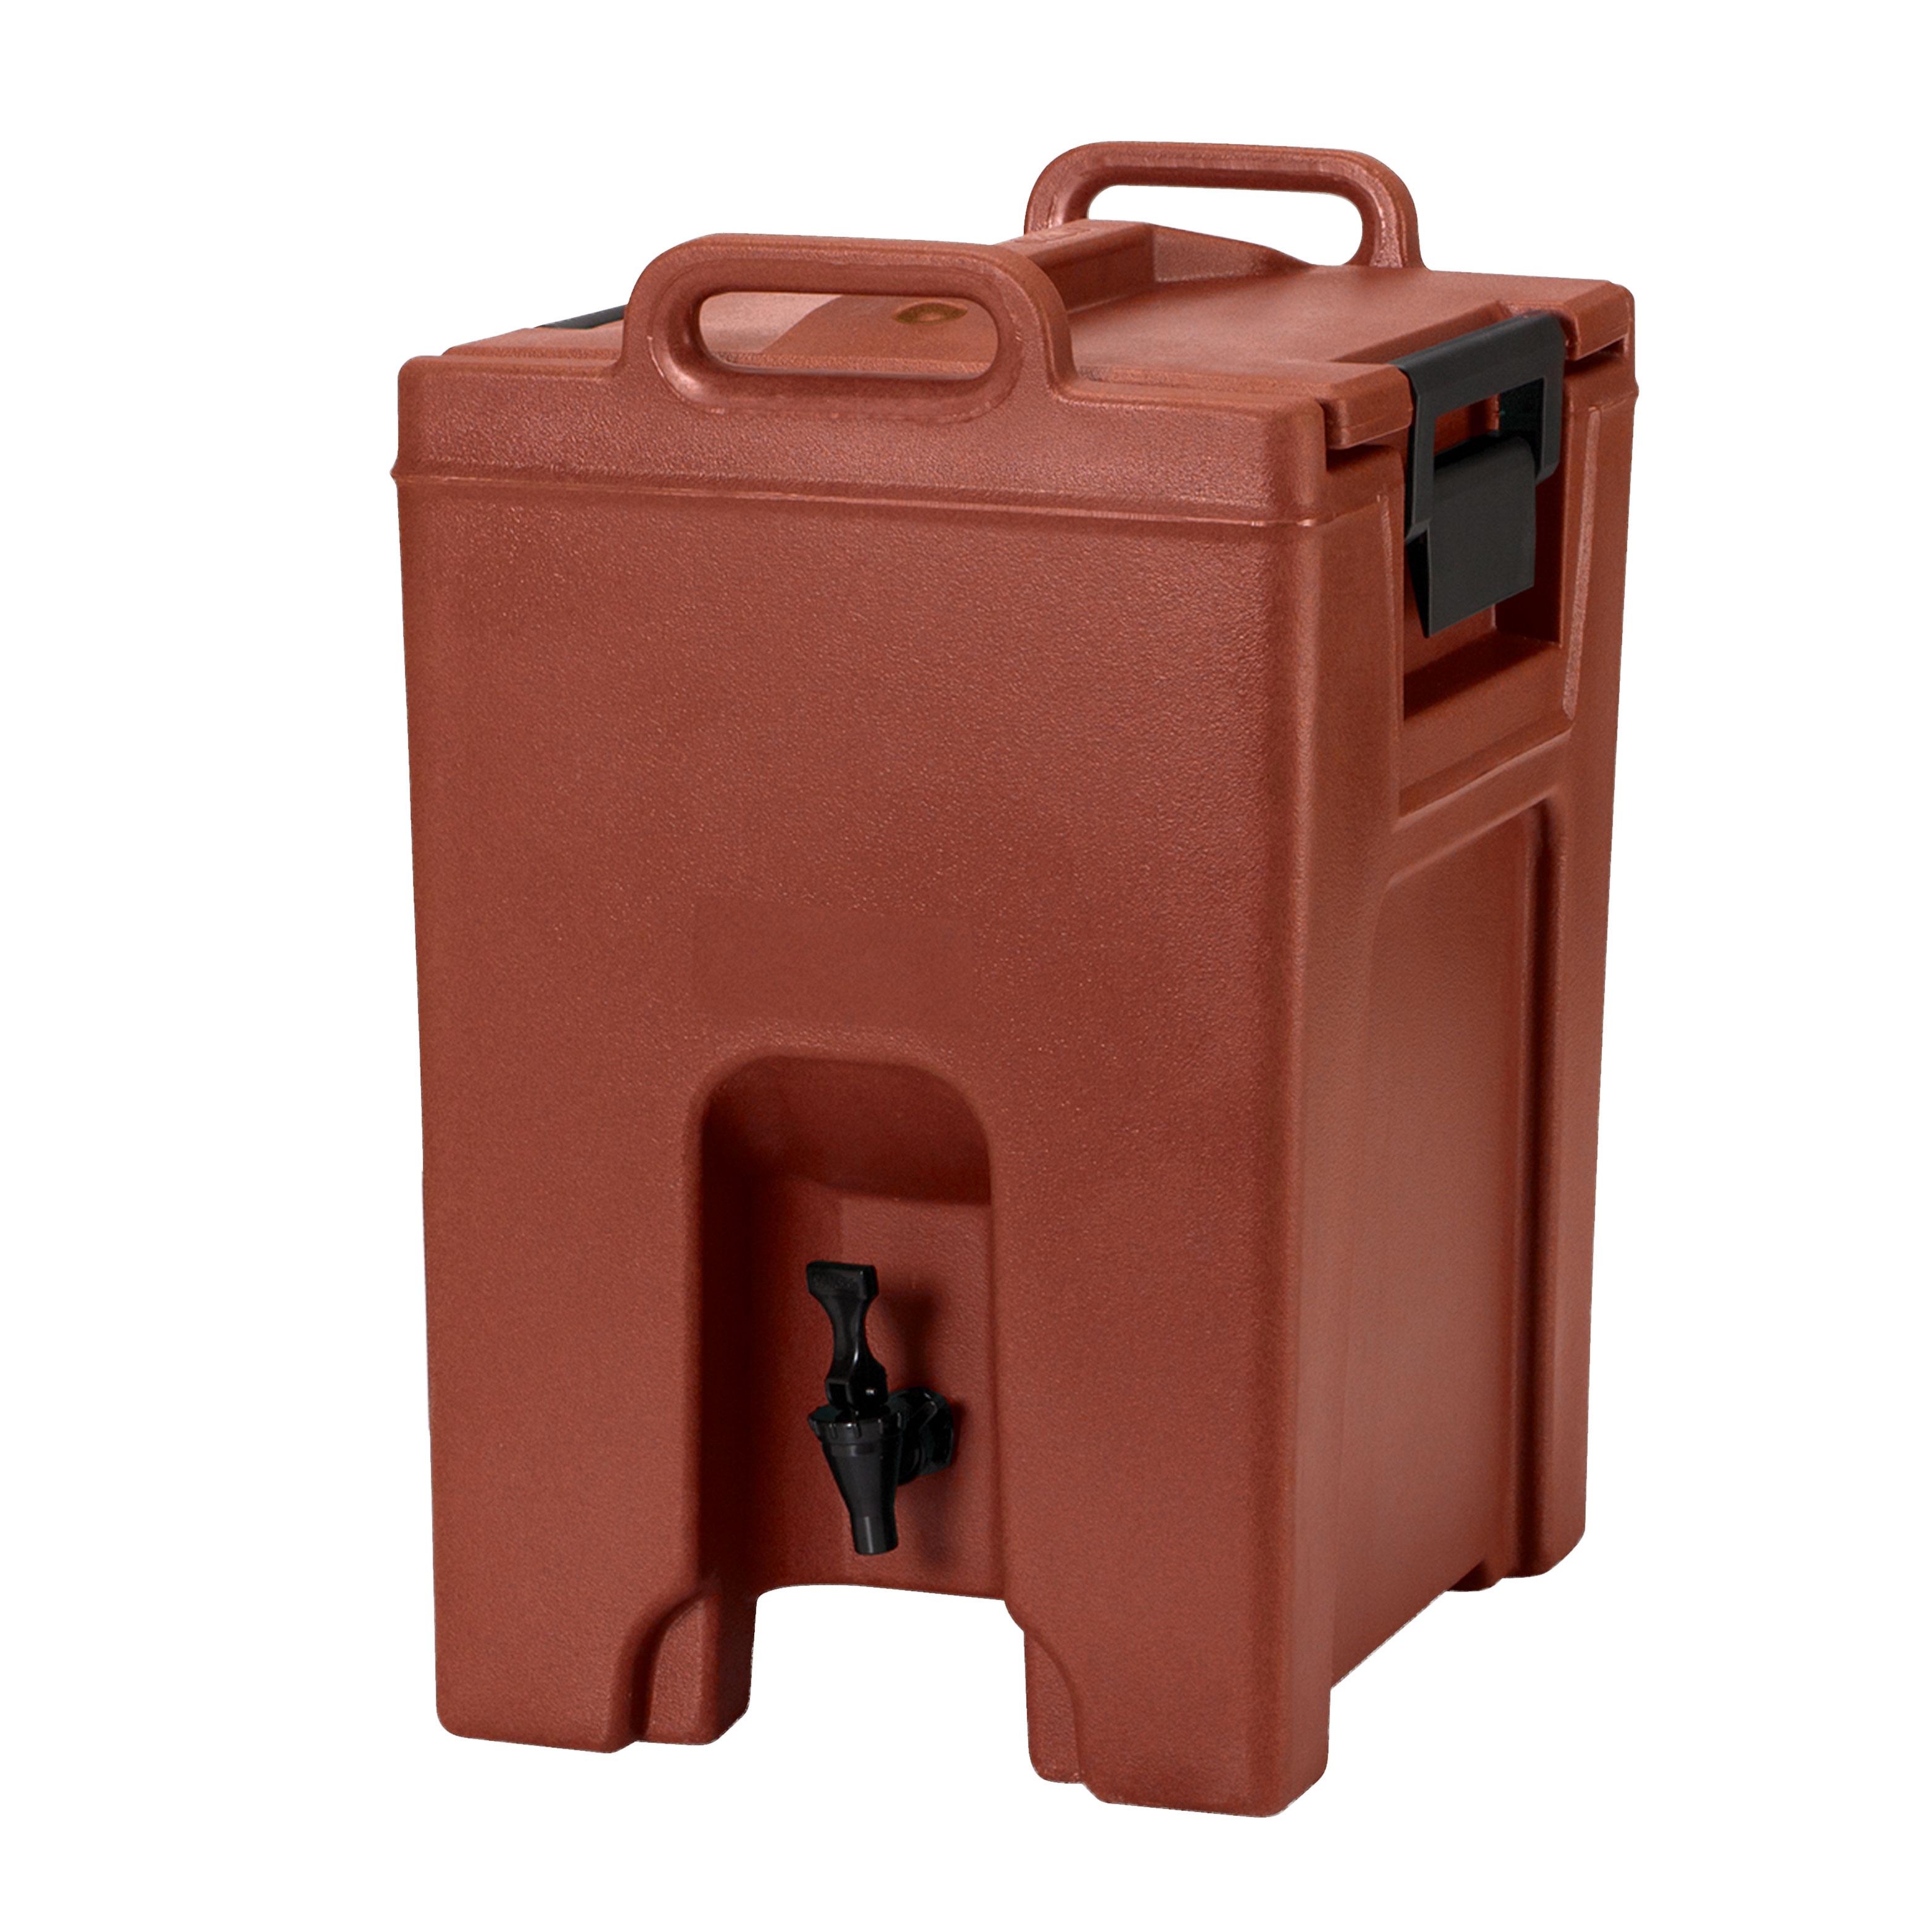 Cambro UC1000402 beverage dispenser, insulated